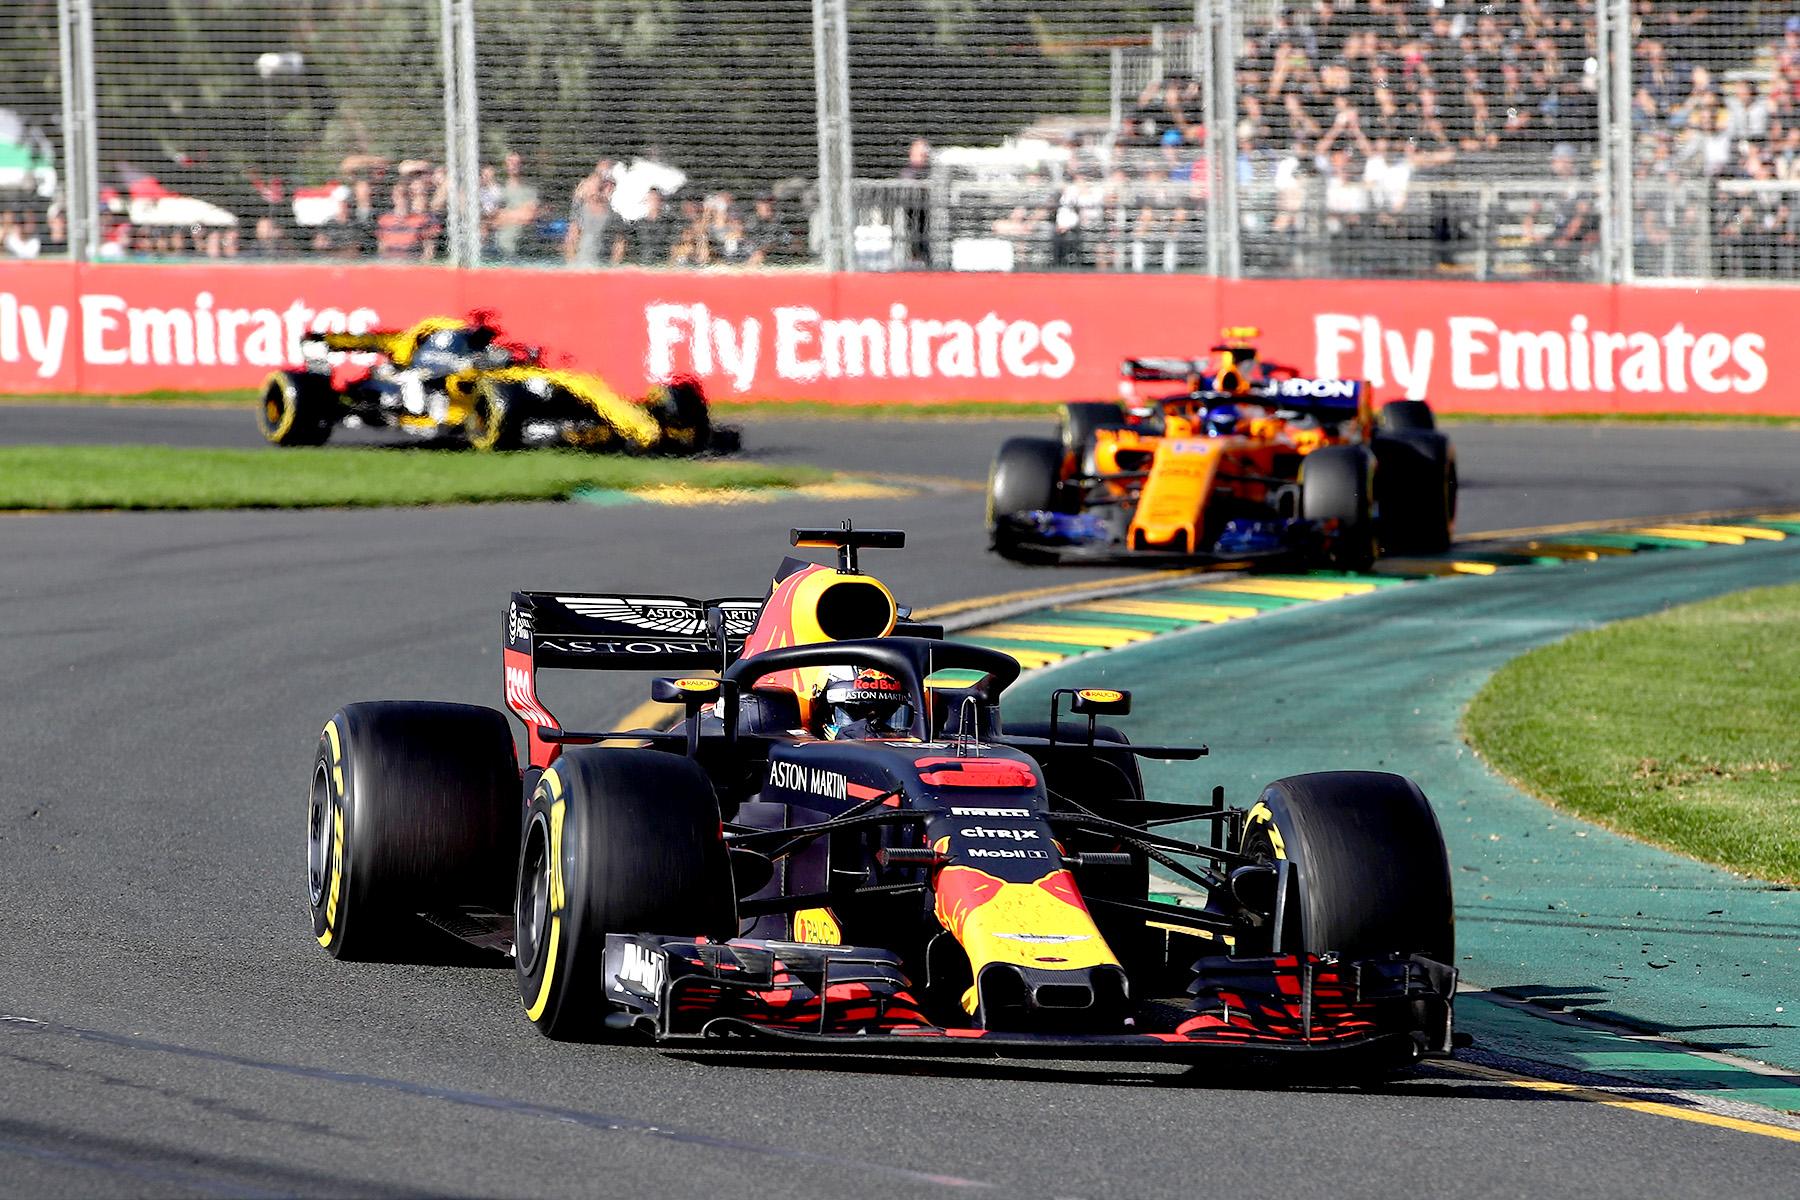 Daniel Ricciardo on track during the 2017 Australian Grand Prix.